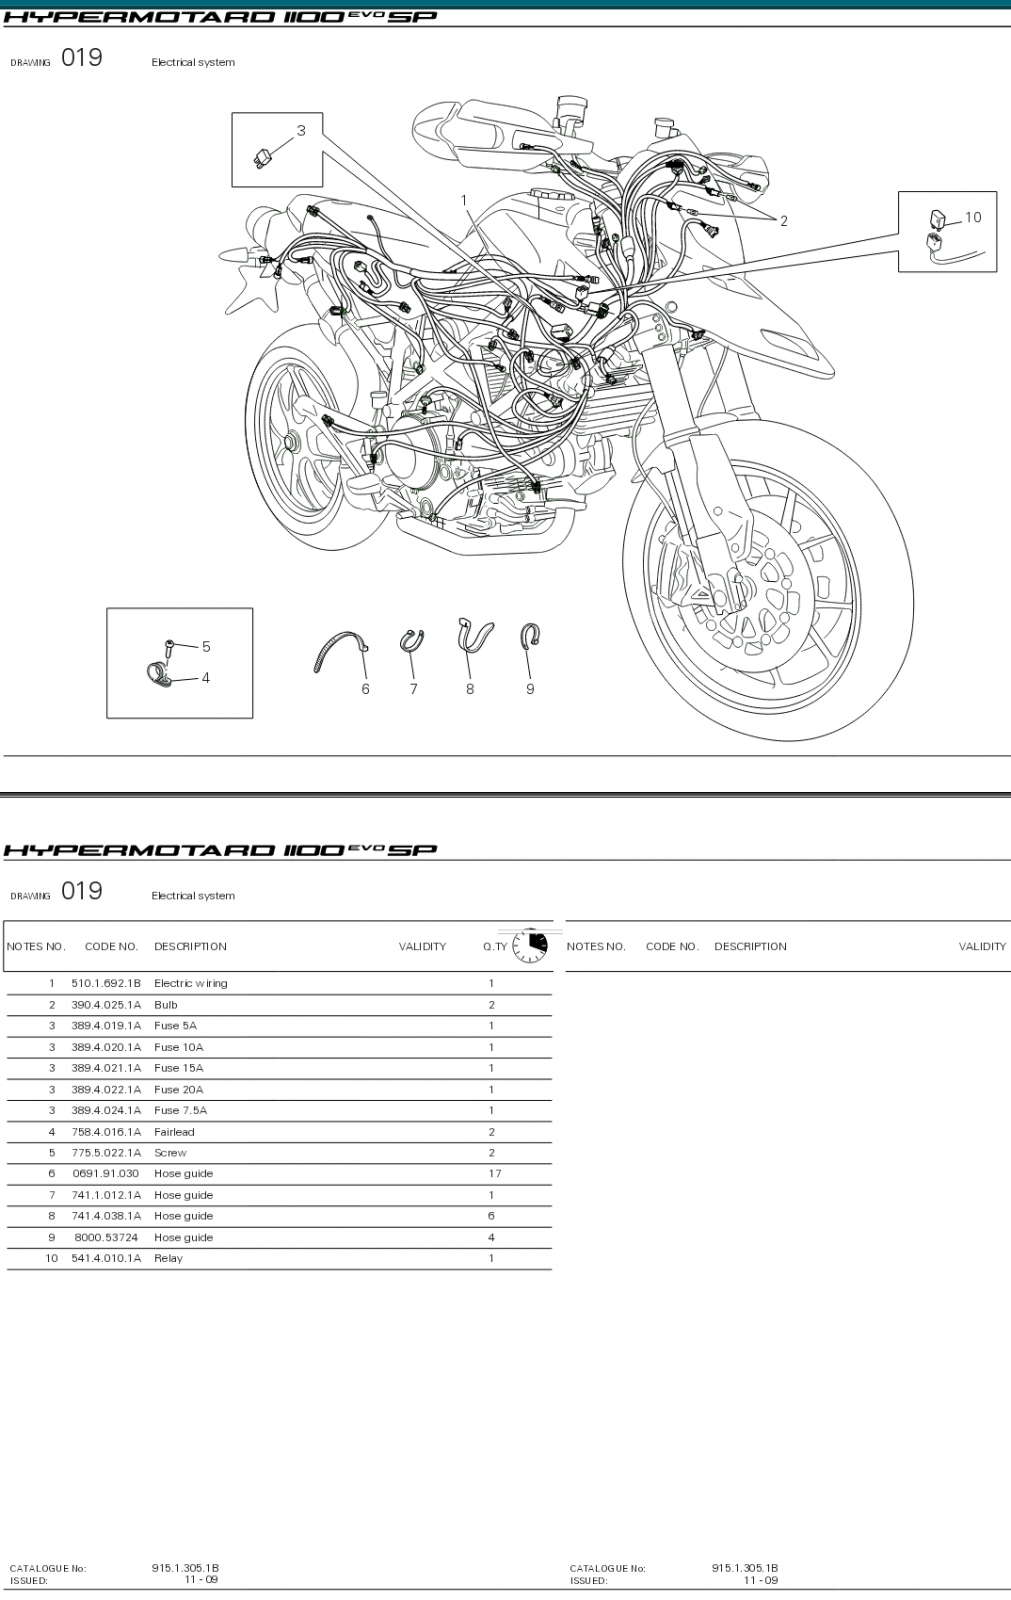 Ducati Hypermotard 1100 Wiring Diagram Electrical Diagrams Multistrada 1200 Dead Needed Page 3 Forum Corse